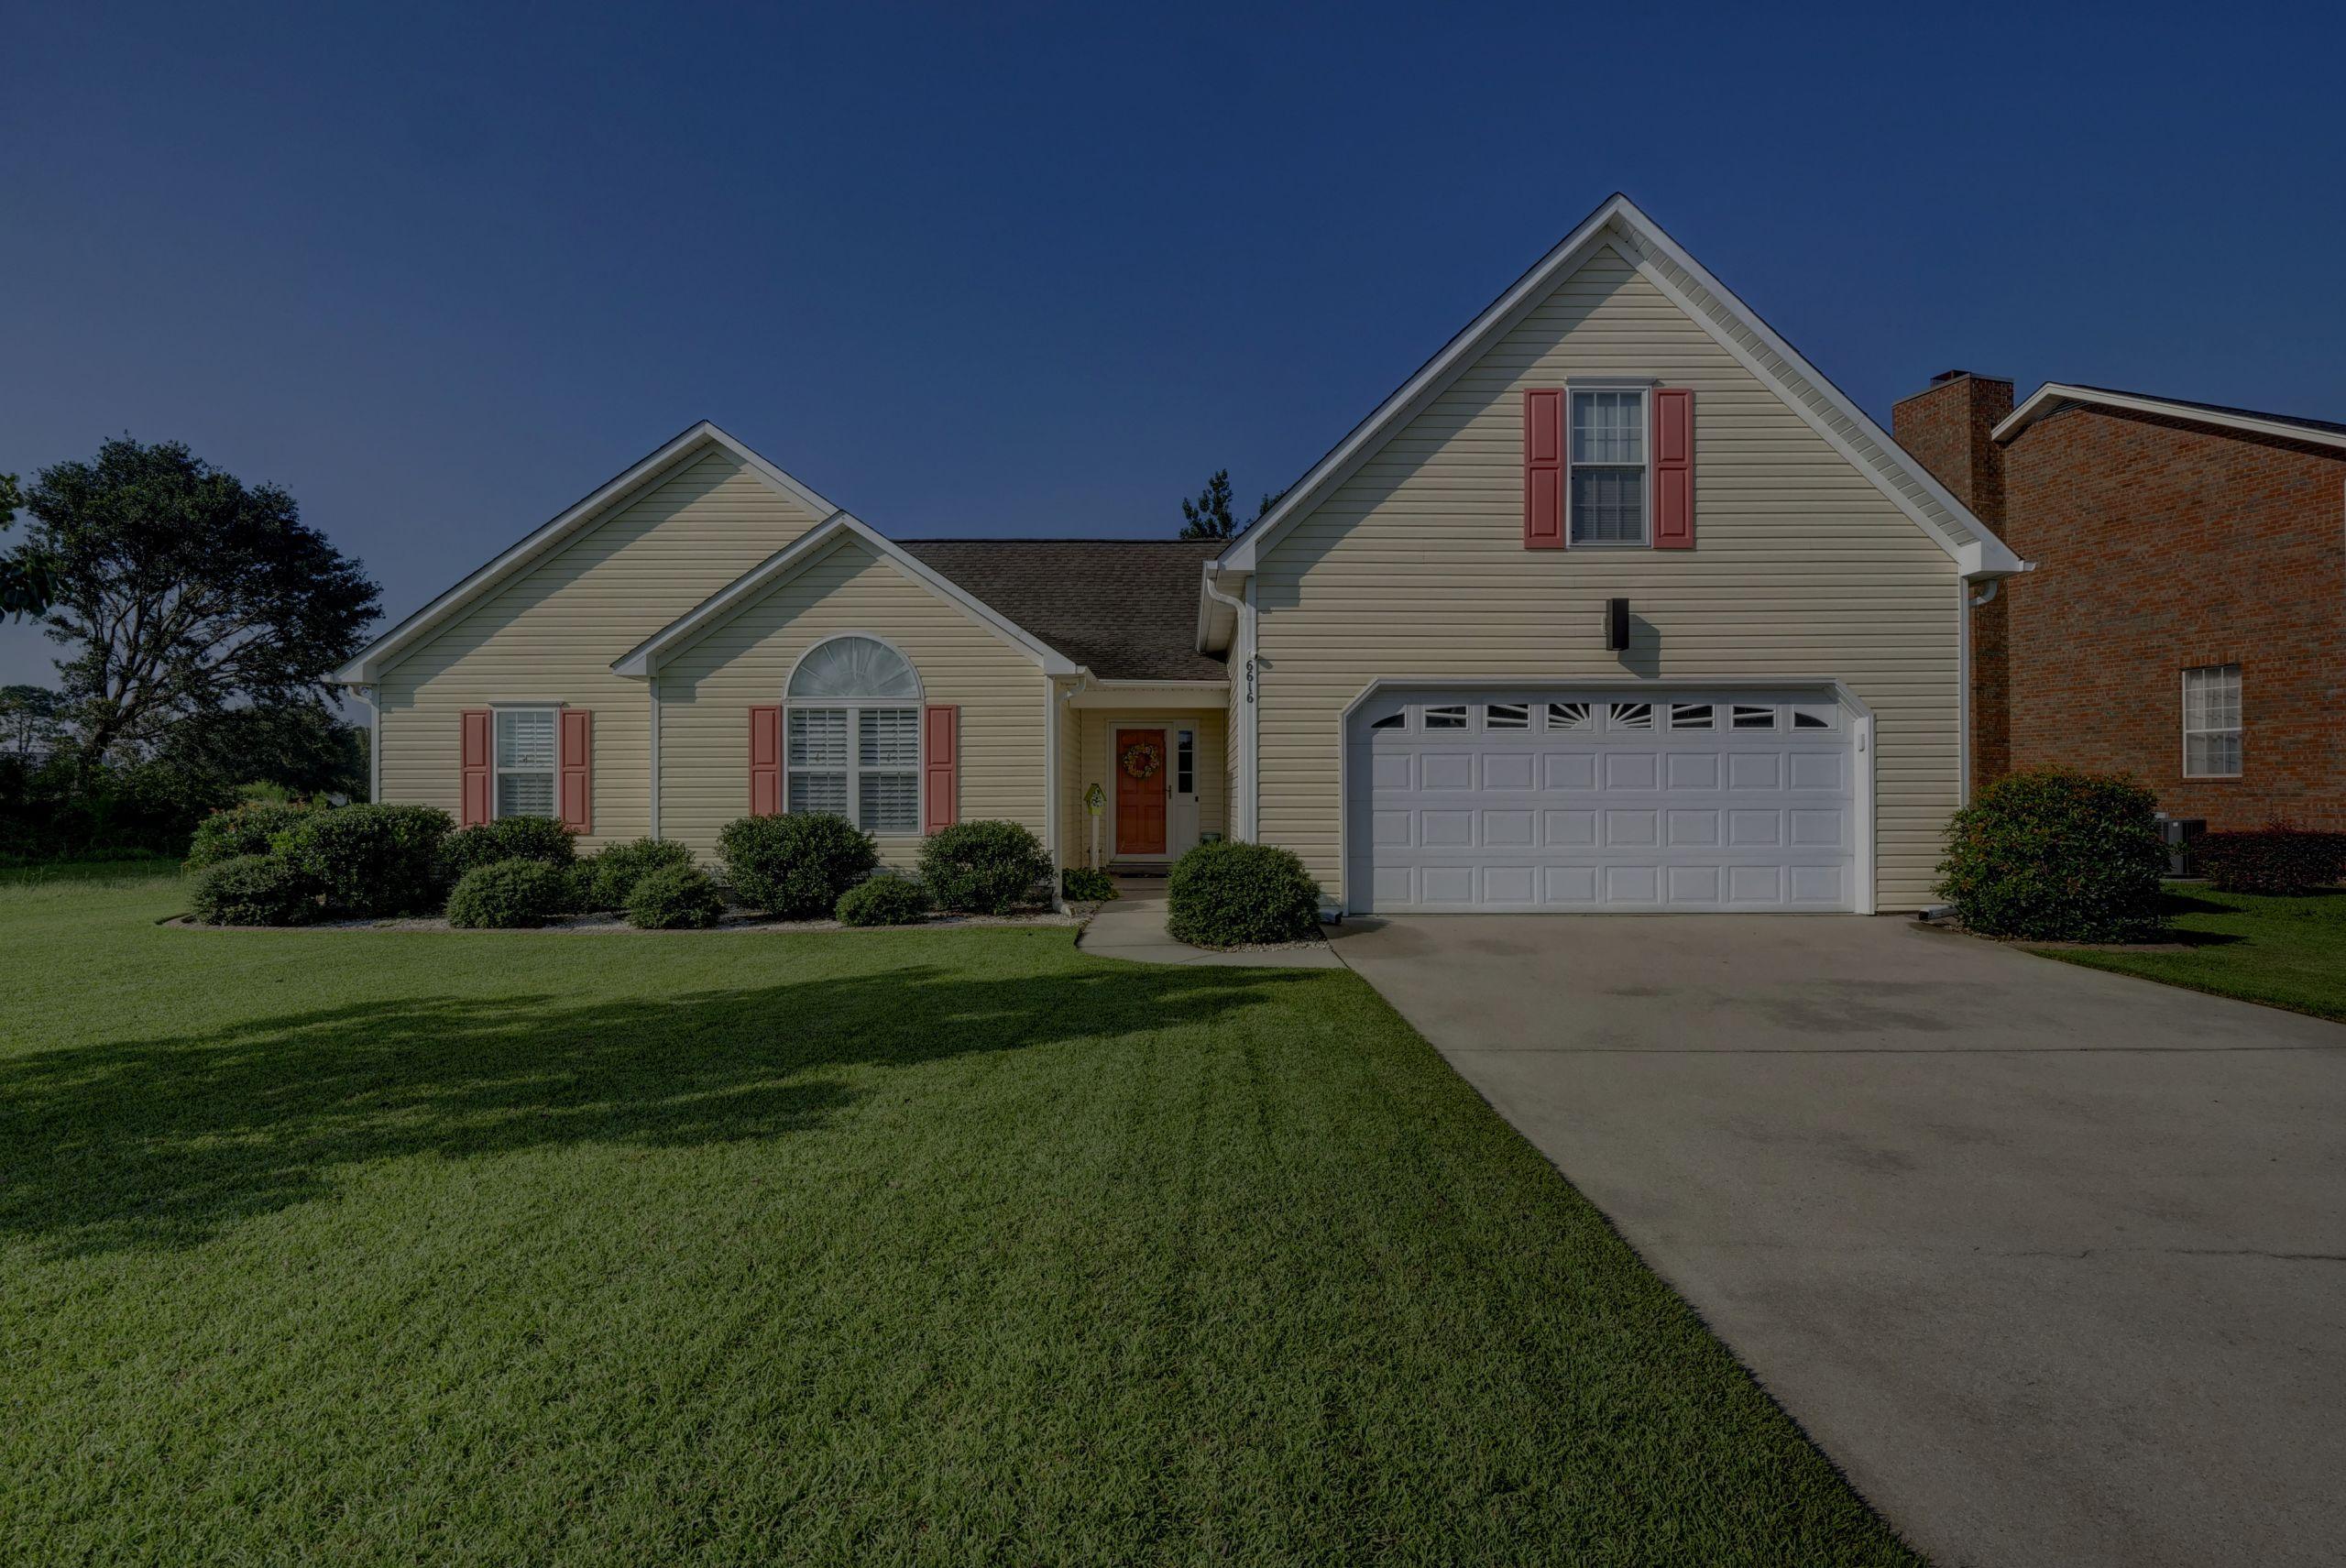 6616 Newbury Way, Wilmington, NC 28411 | Reignited Real Estate